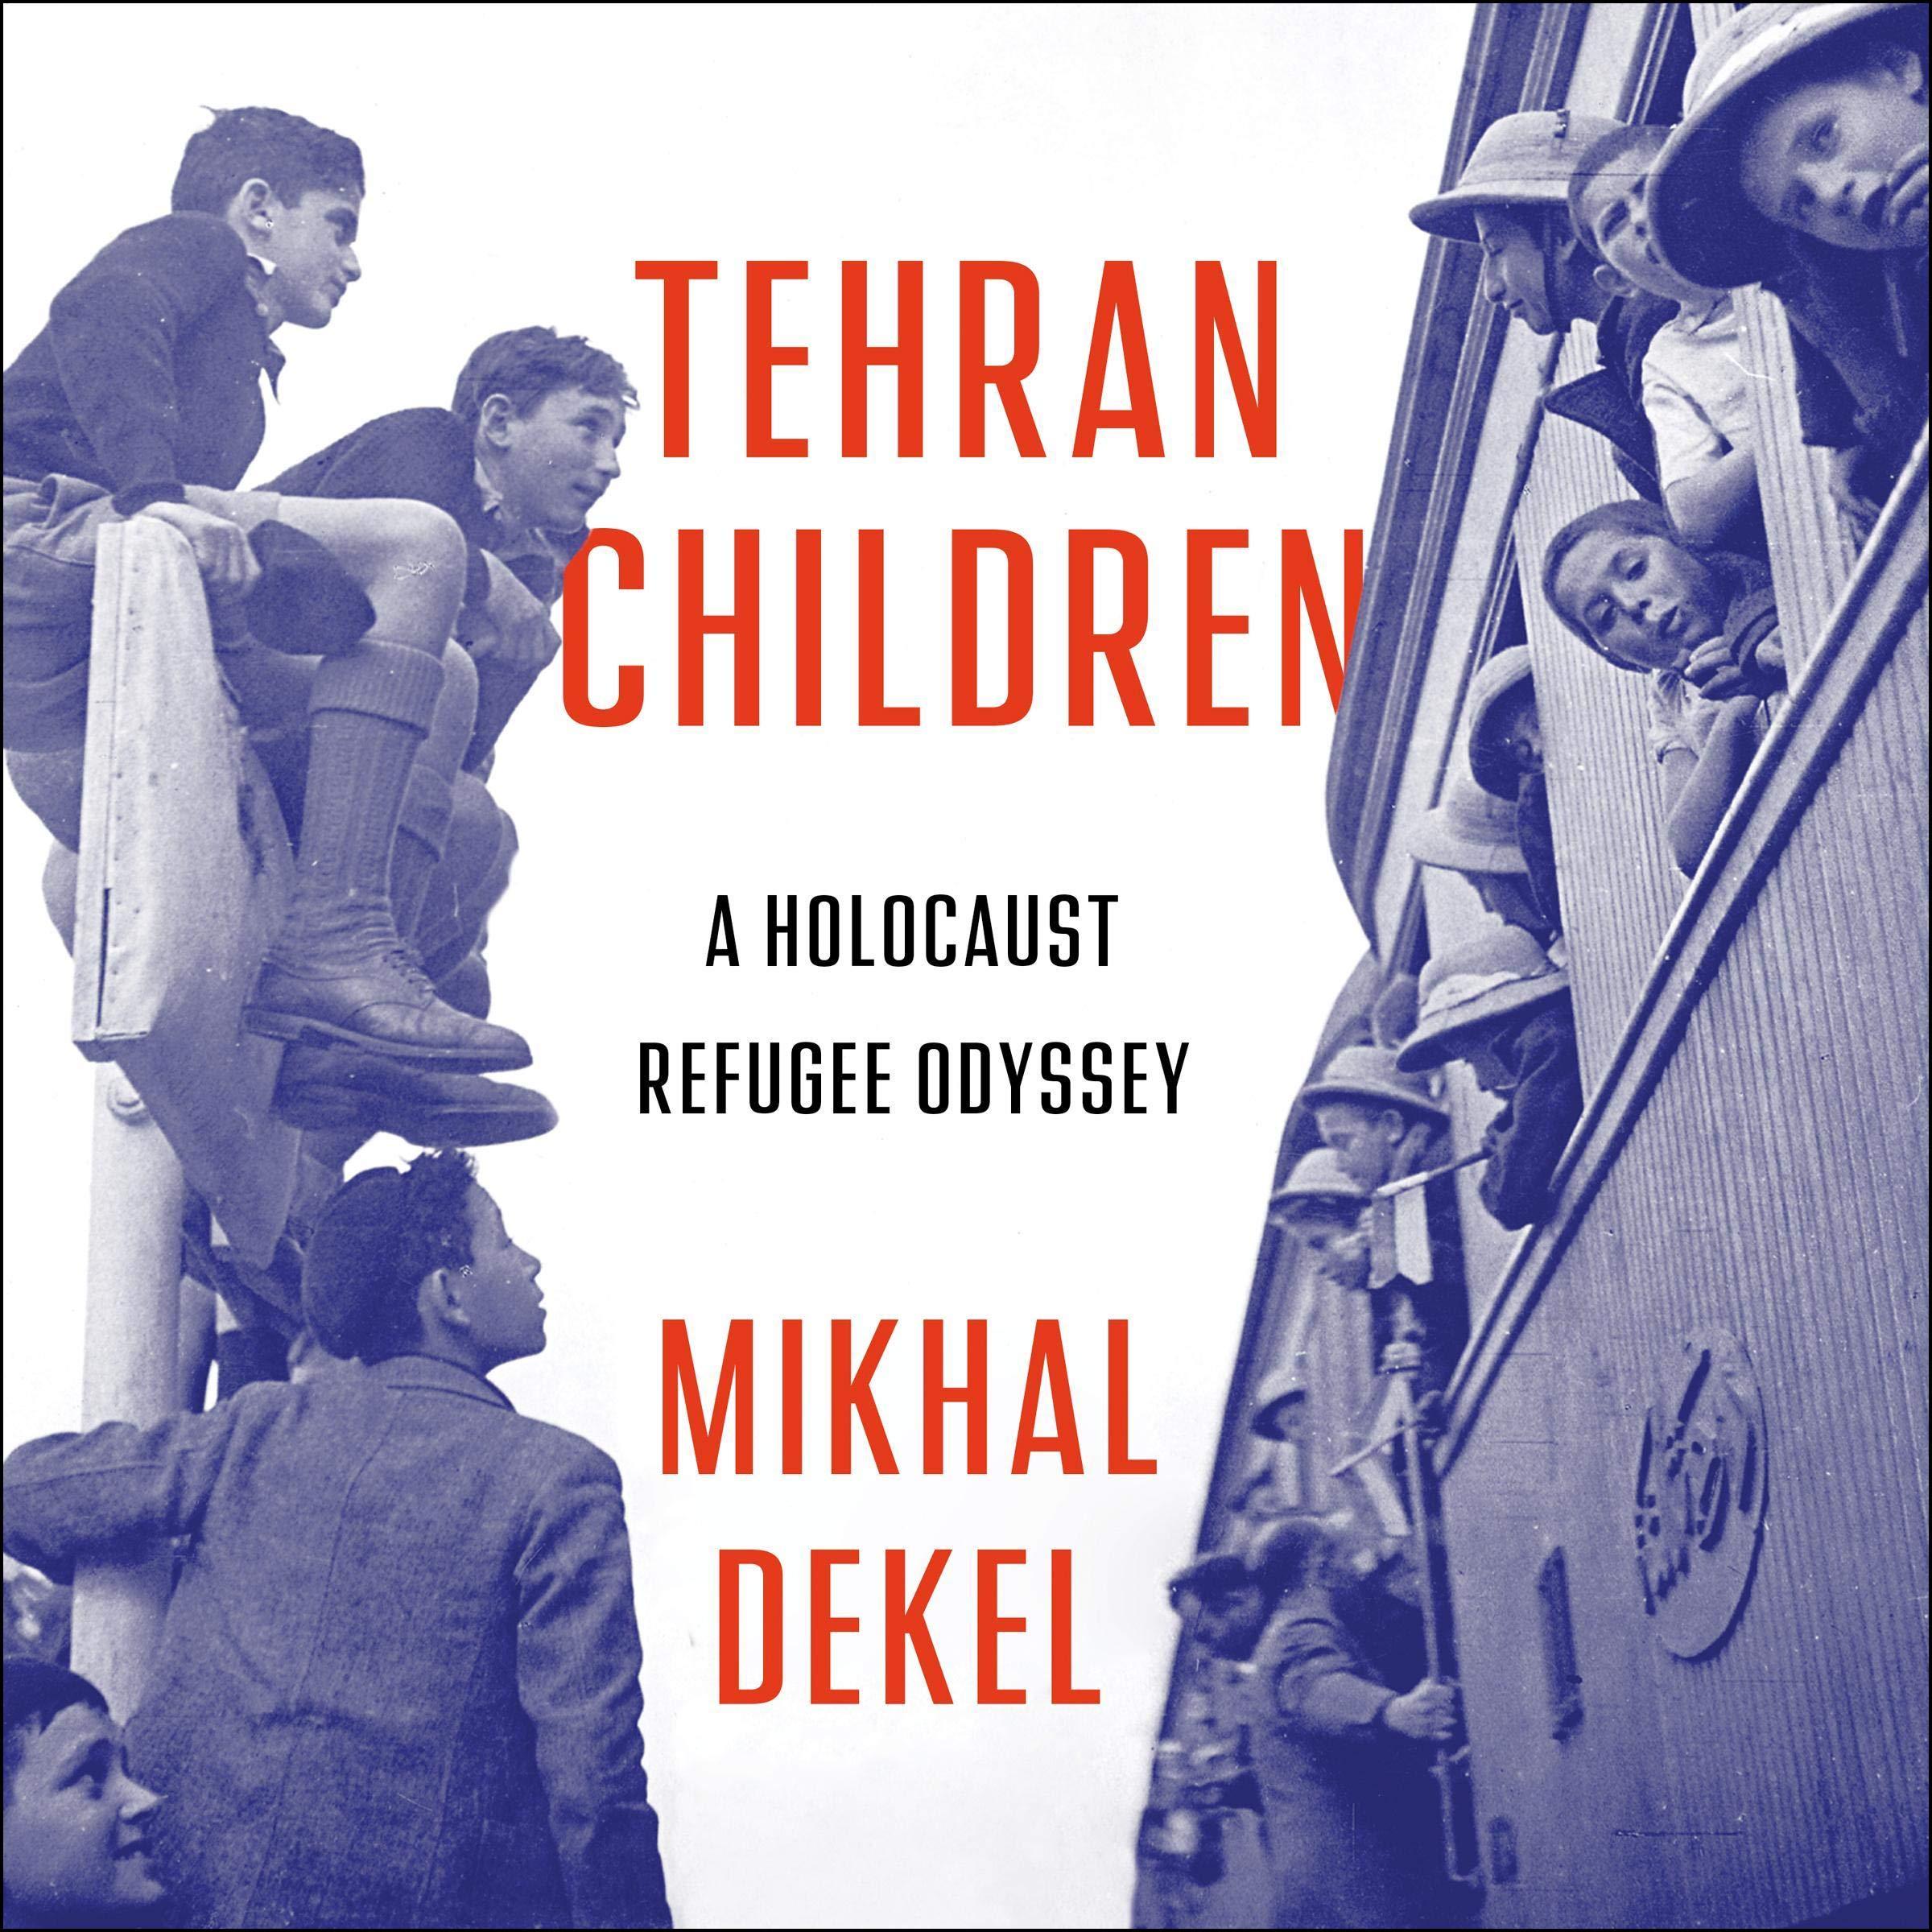 Tehran Children  A Holocaust Refugee Odyssey